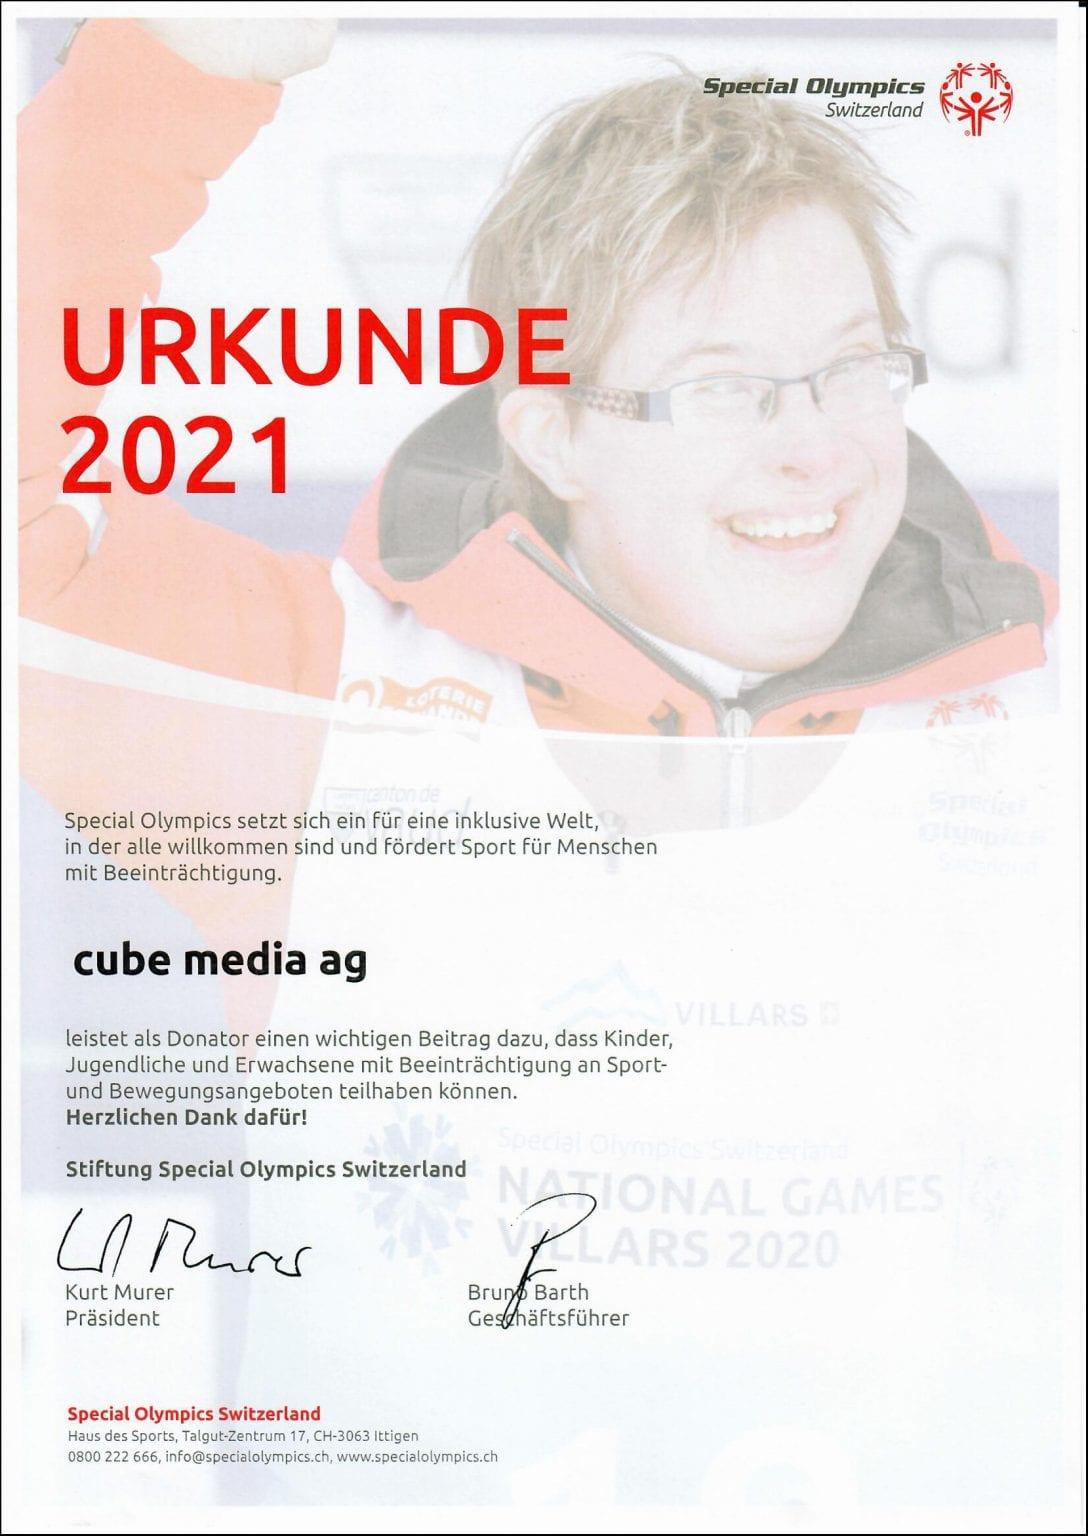 Special Olympics Switzerland - cube media AG 2